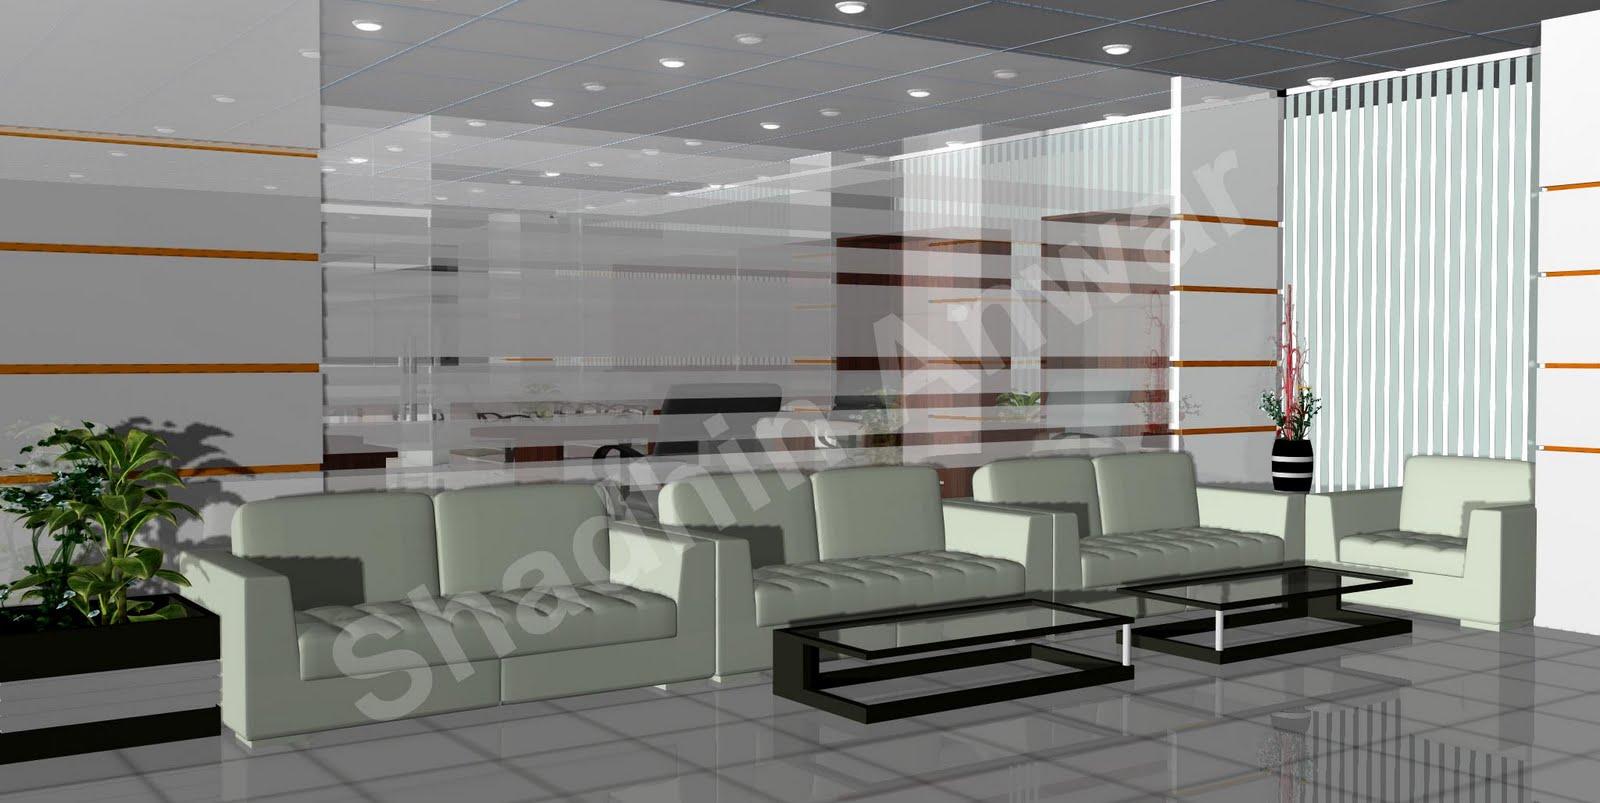 shadhin s personal blog 3d views of office interior design